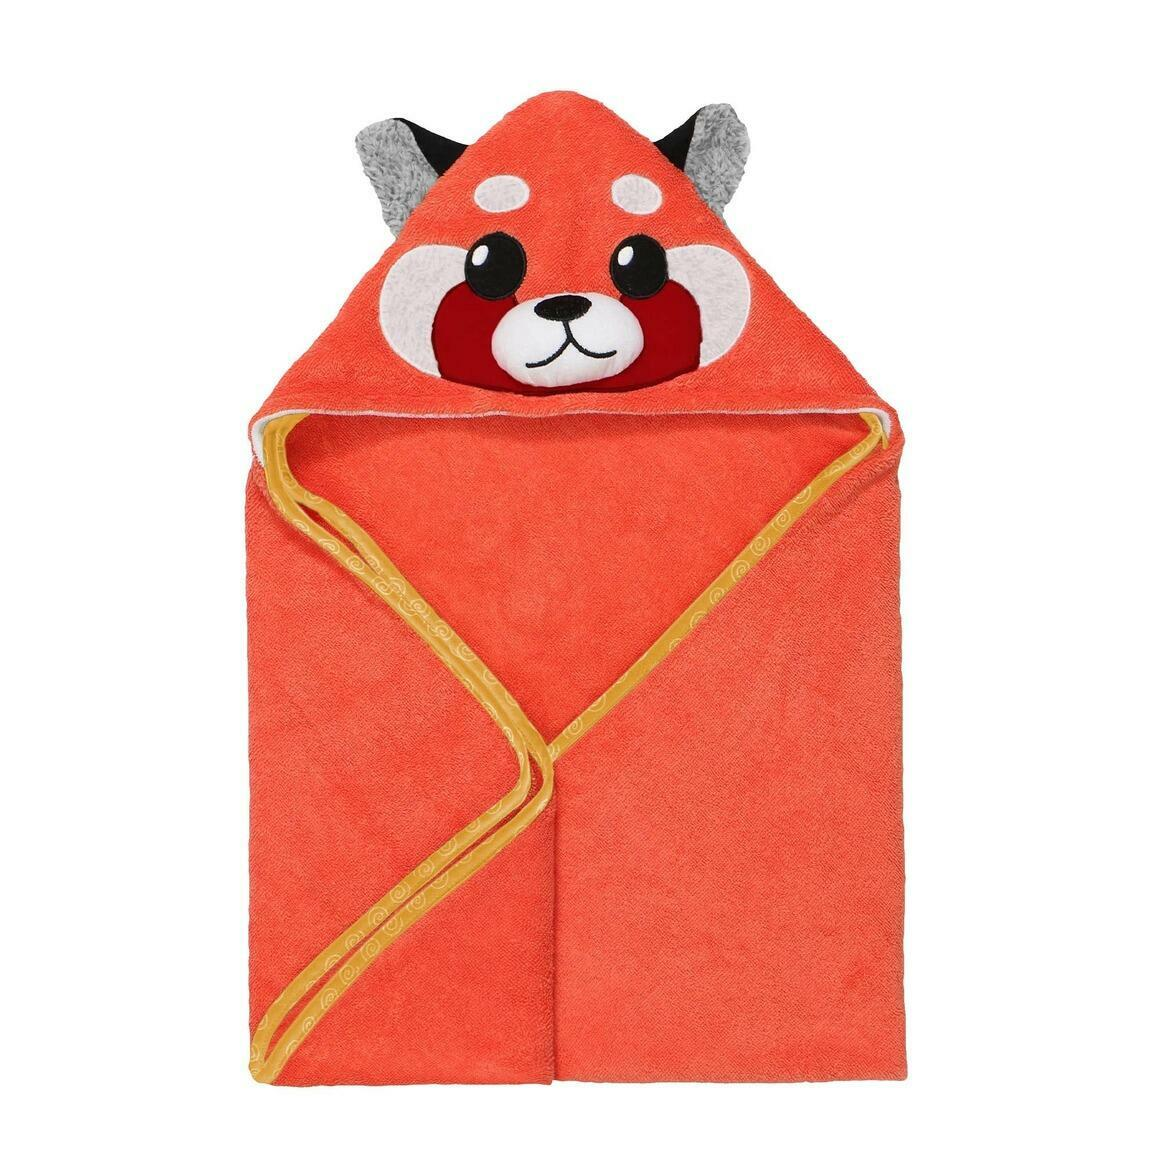 Baby Snow Terry Hooded Bath Towel Red Panda 0-18M | Trada Marketplace